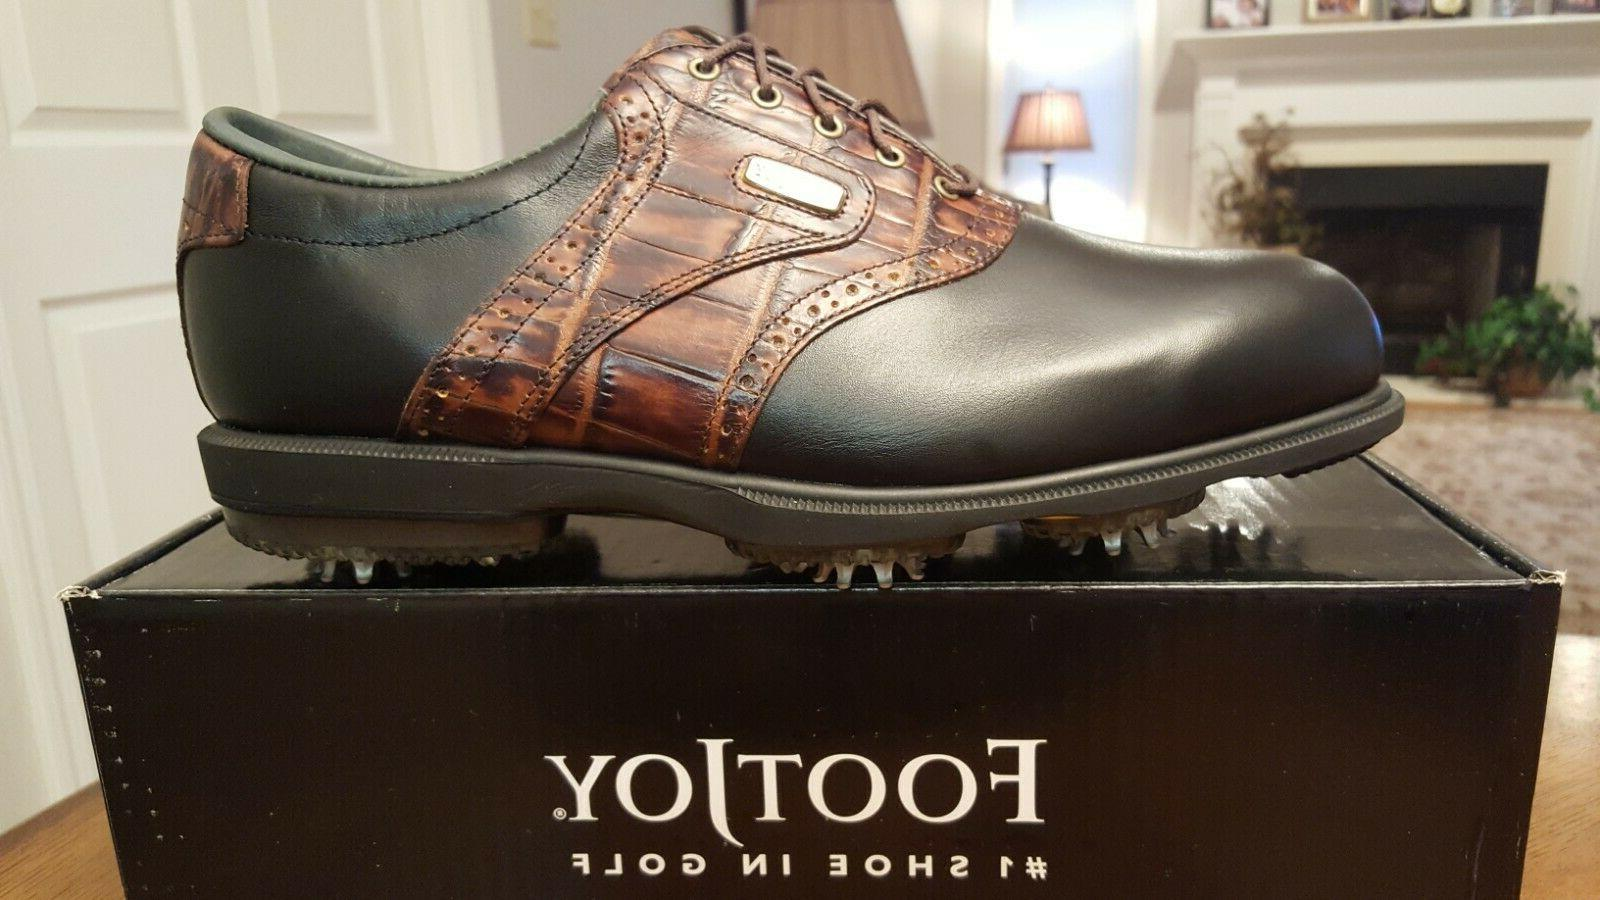 2014 dryjoys mens golf shoes 53729 new